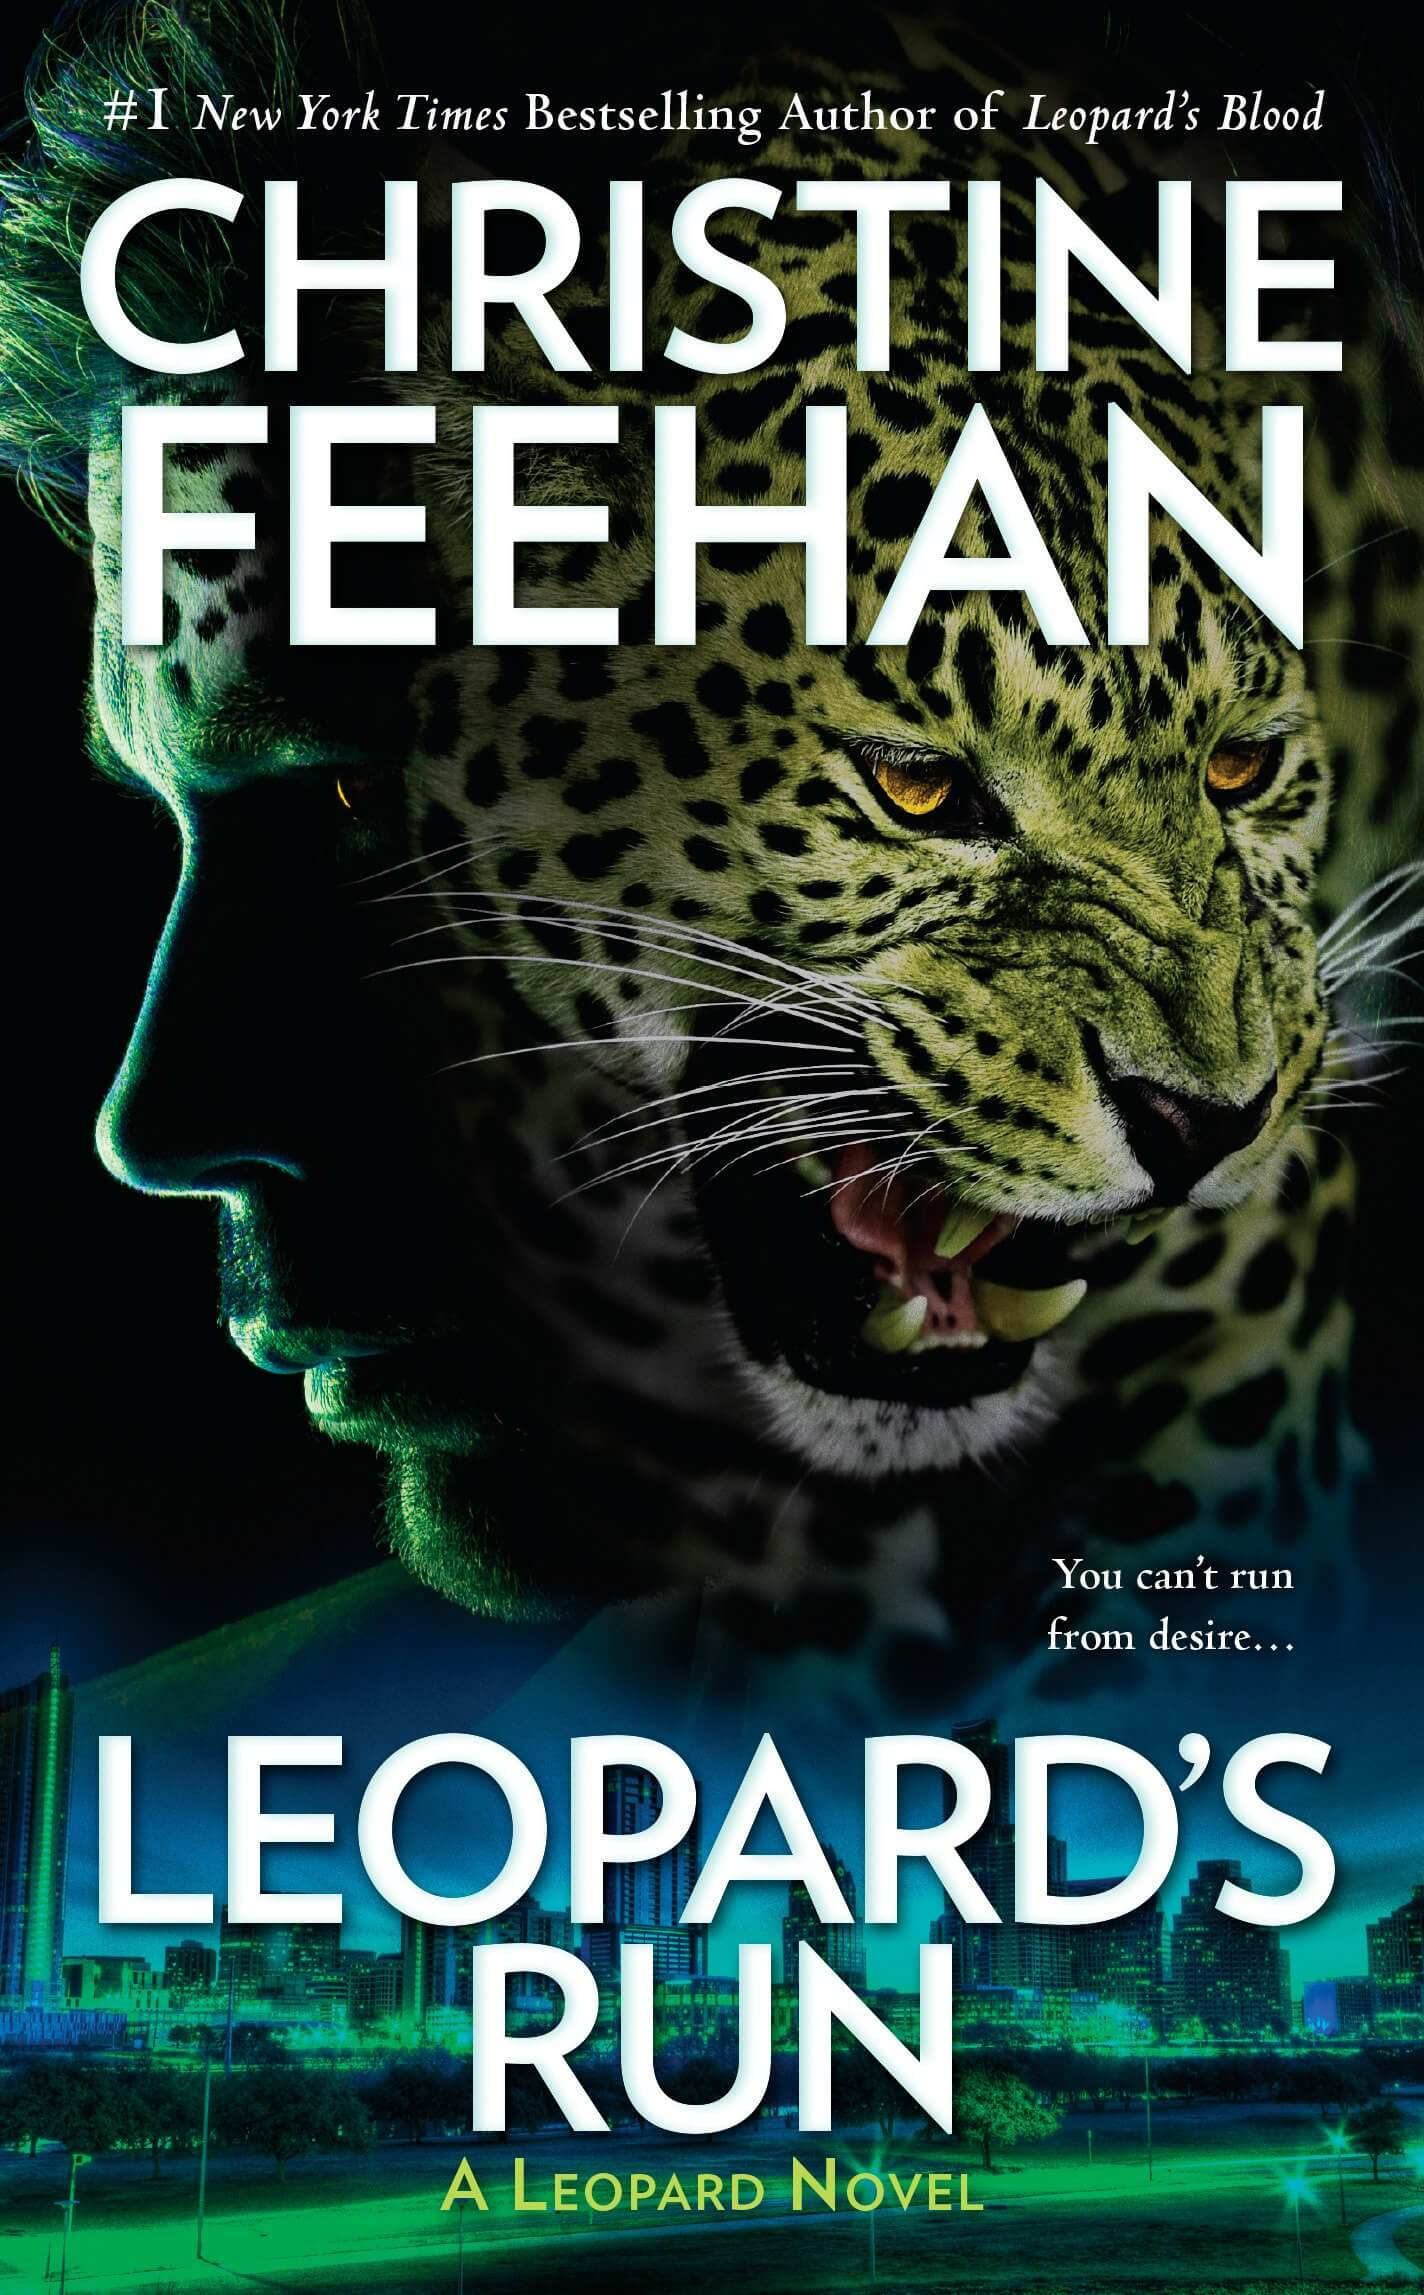 #NewRelease Leopard's Run by Christine Feehan